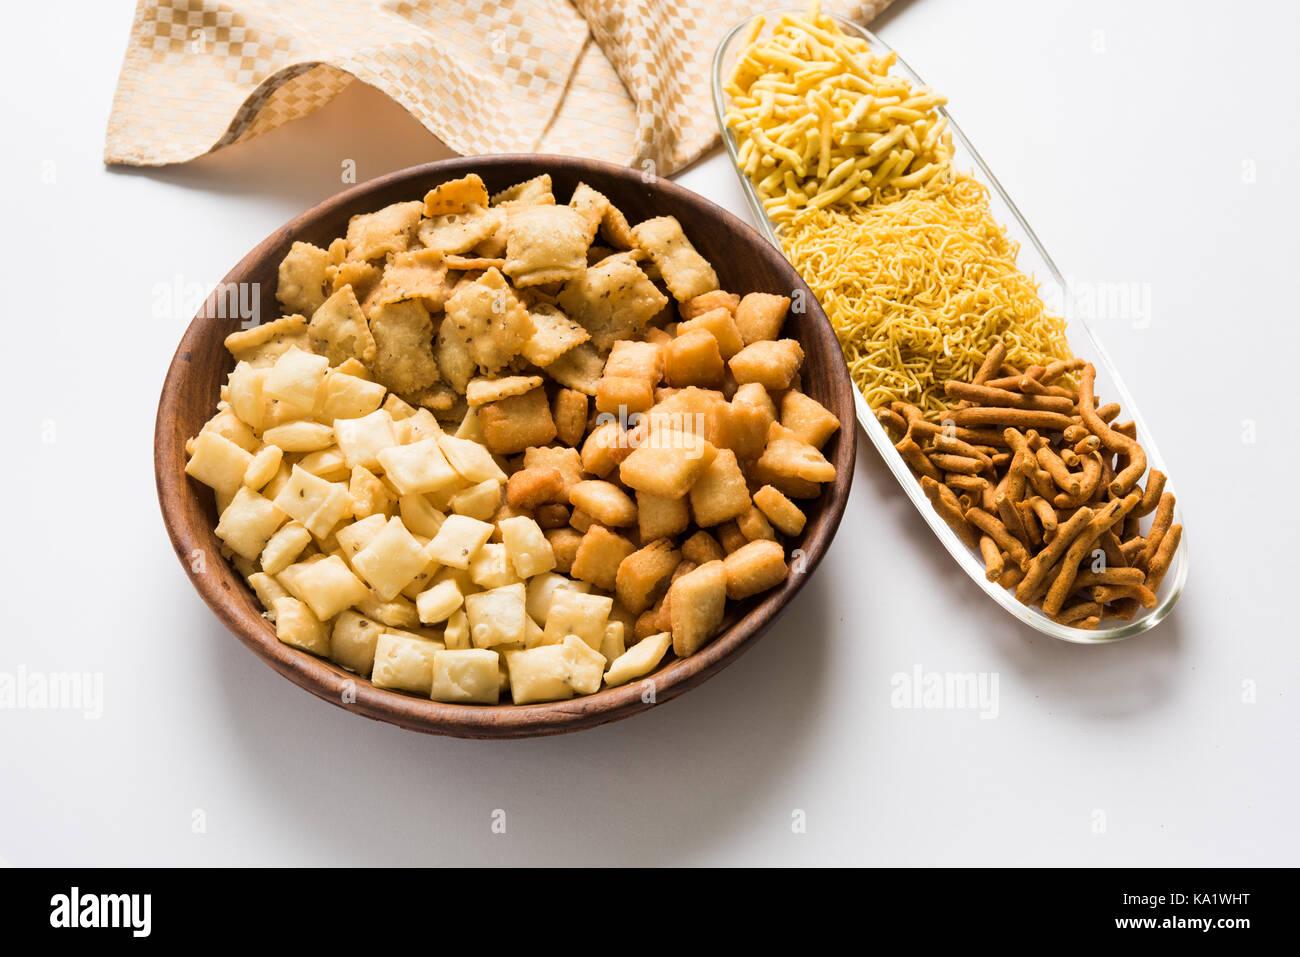 stock photo of Yellow Namkeen sev variety with shakkar para or shankar pale, Shakkarpare, Shakarpali served in white Stock Photo